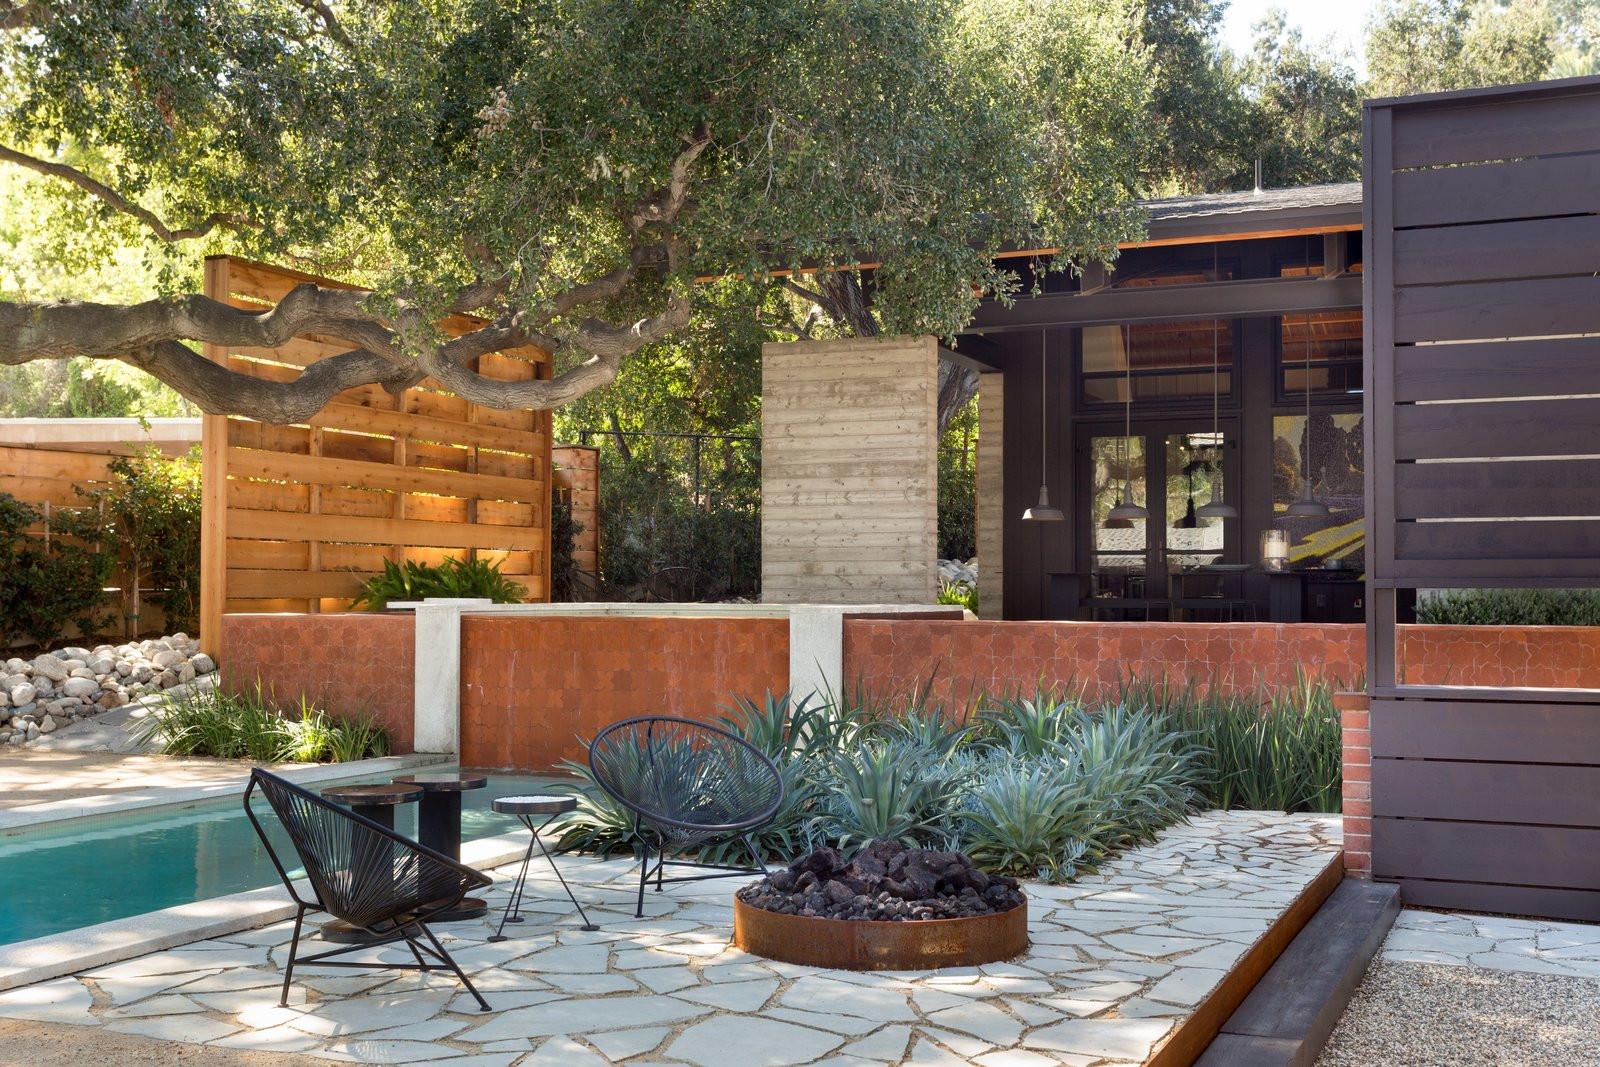 Best ideas about Backyard Landscape Ideas . Save or Pin 6 Backyard Landscape Designs That Need Minimal Maintenance Now.